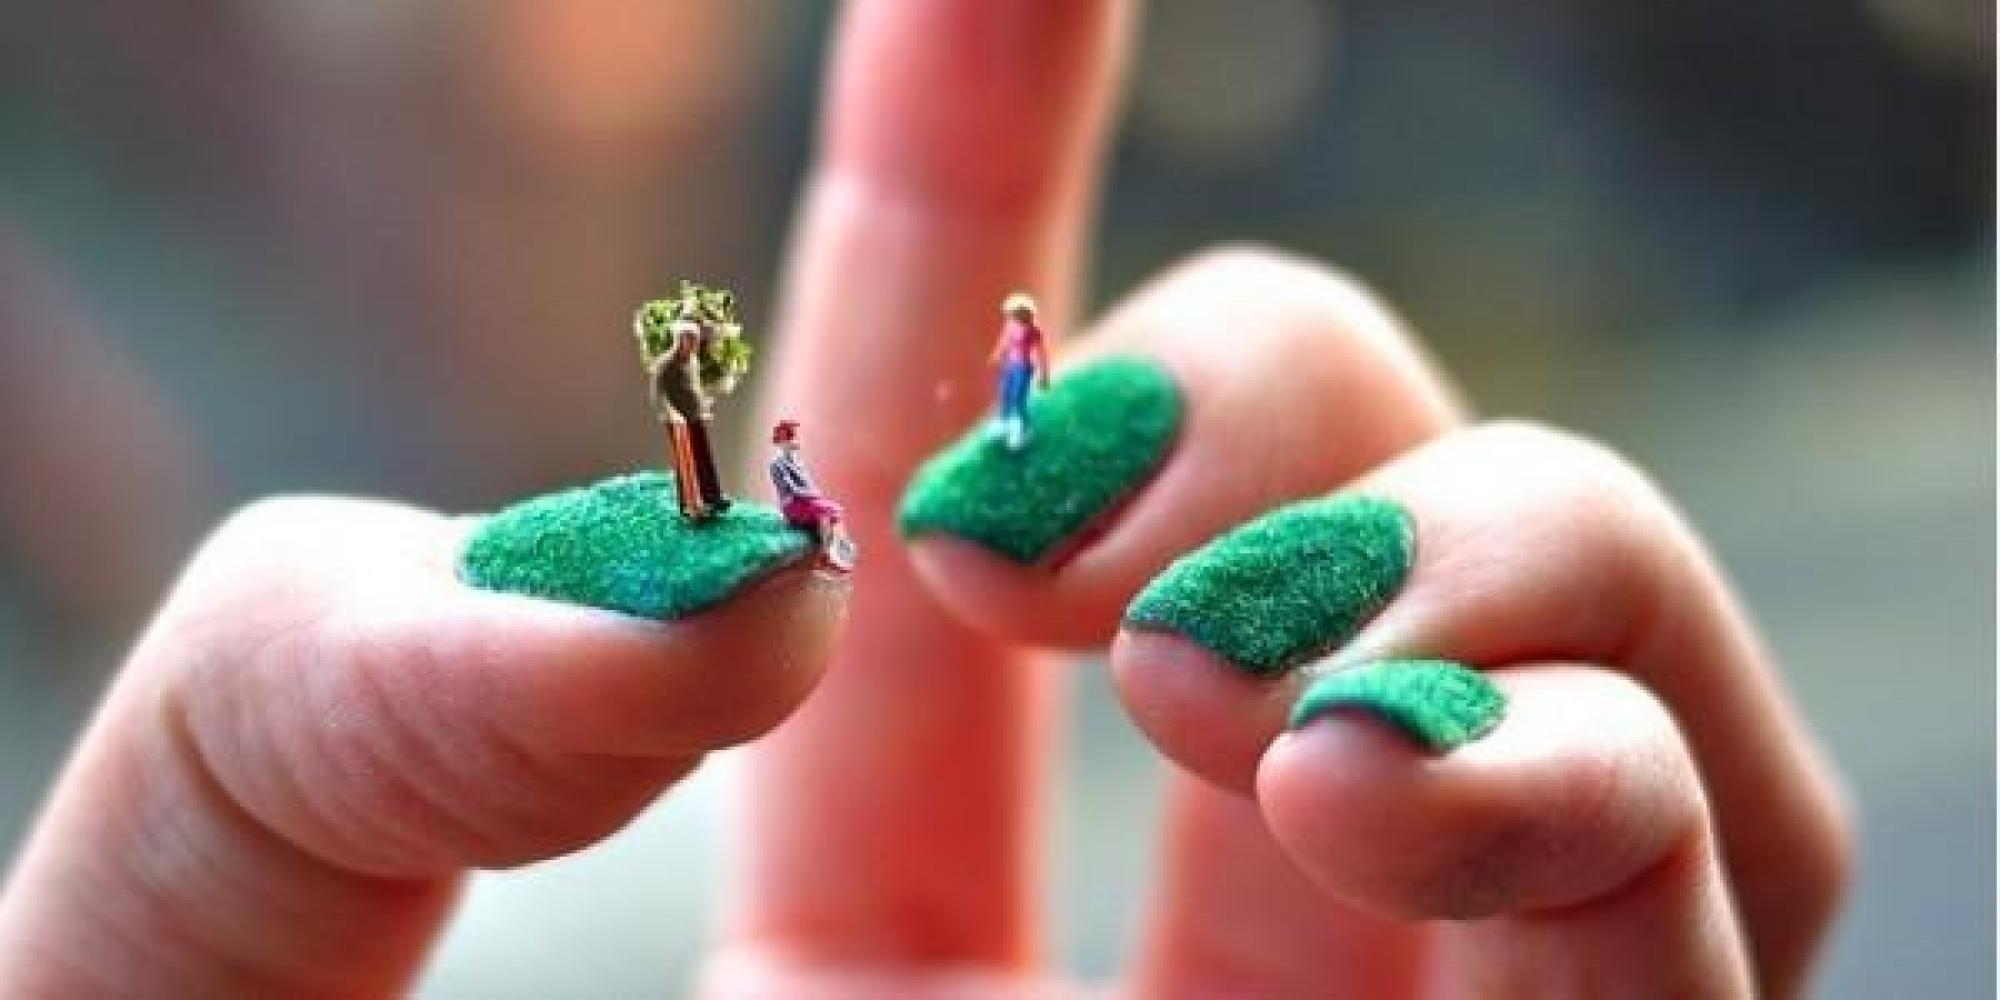 Coolest Nail Art Ever Diy Pinterest